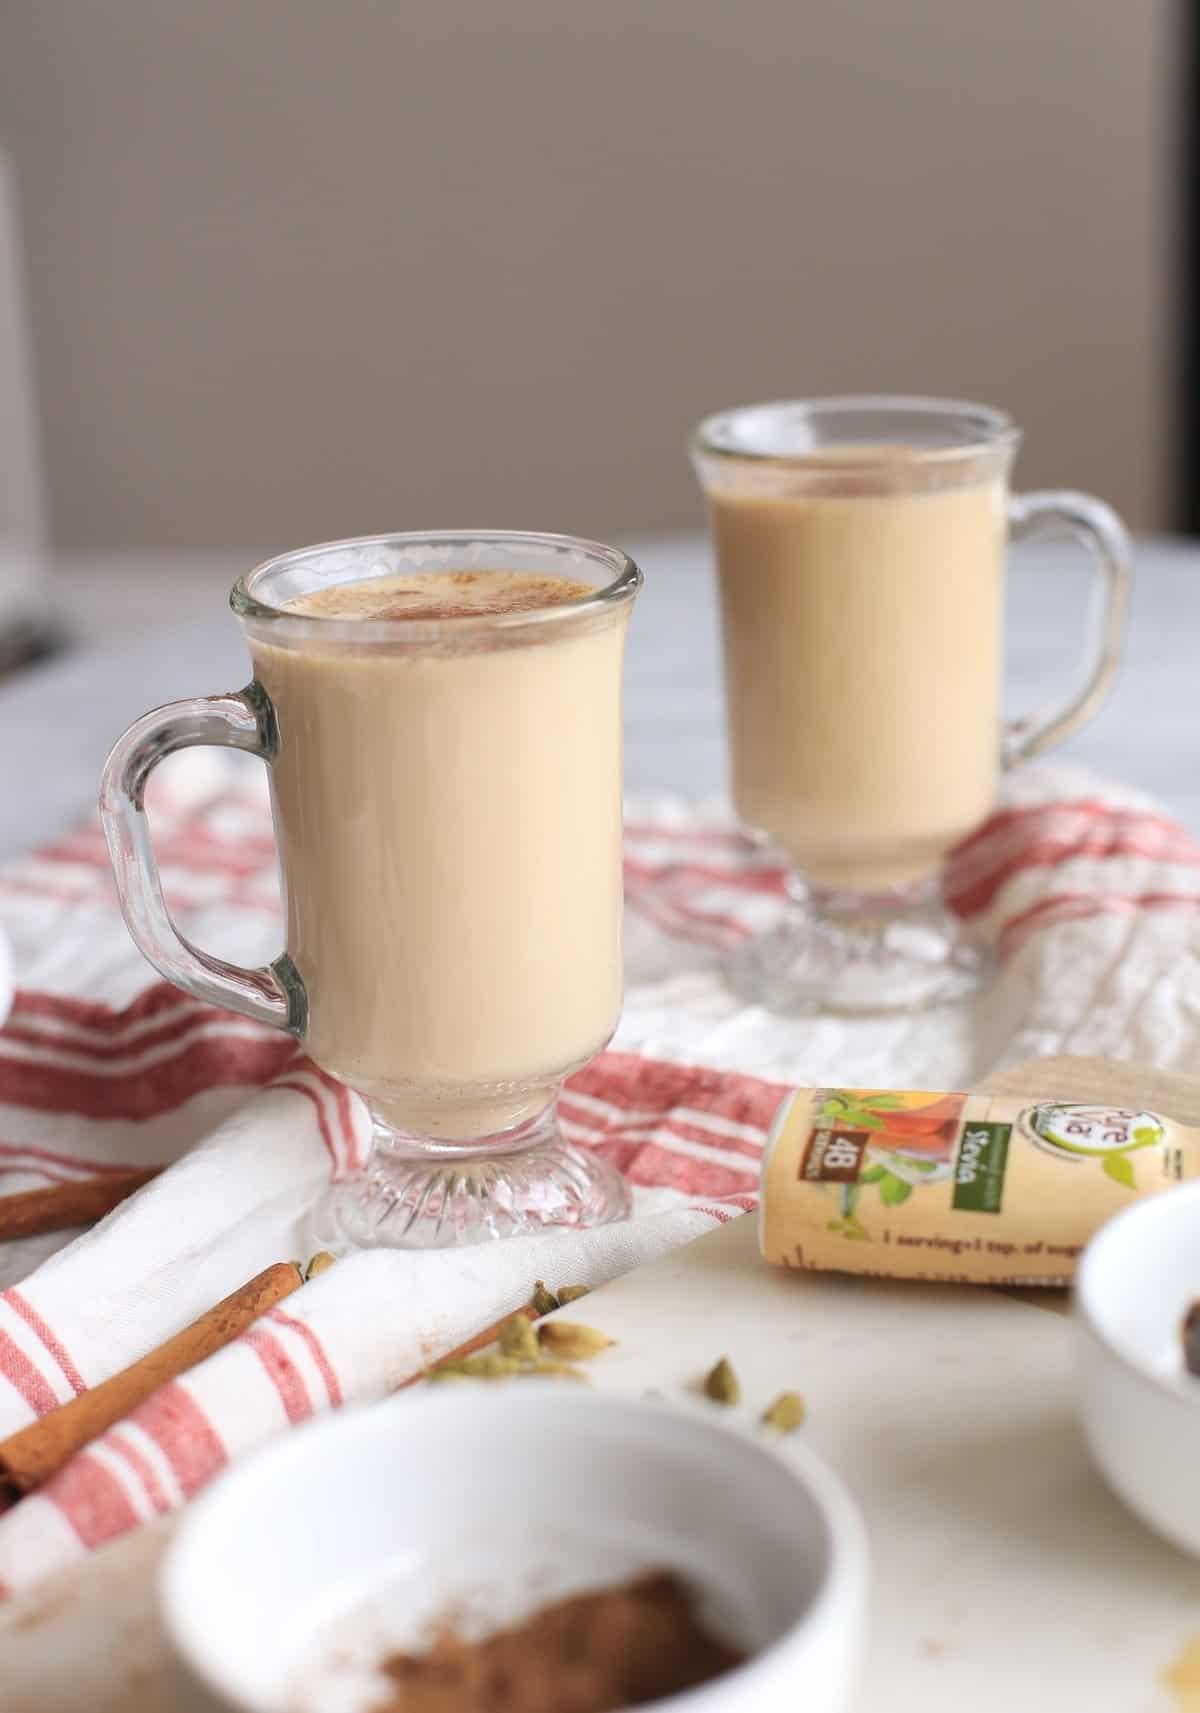 Chai Latte Ingredients and recipe via @mystylevita